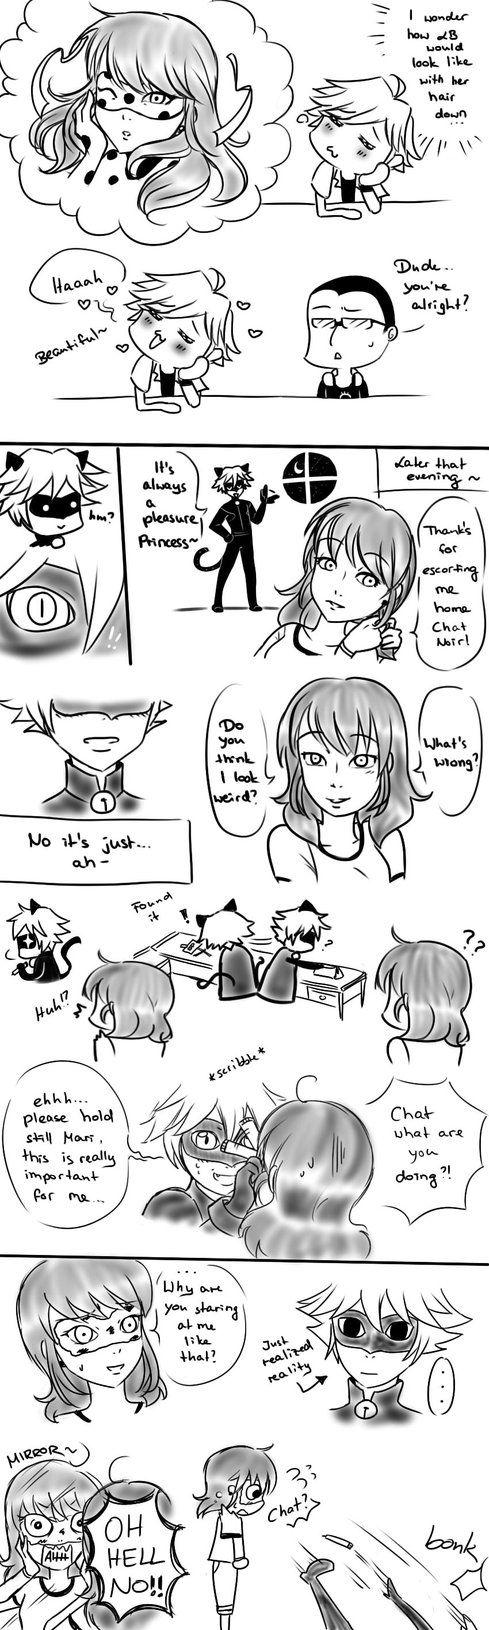 Miraculous Ladybug & Chat Noir - Chat Noir and Marinette - Loose hair - MLB Comic by kaminekoshi.deviantart.com